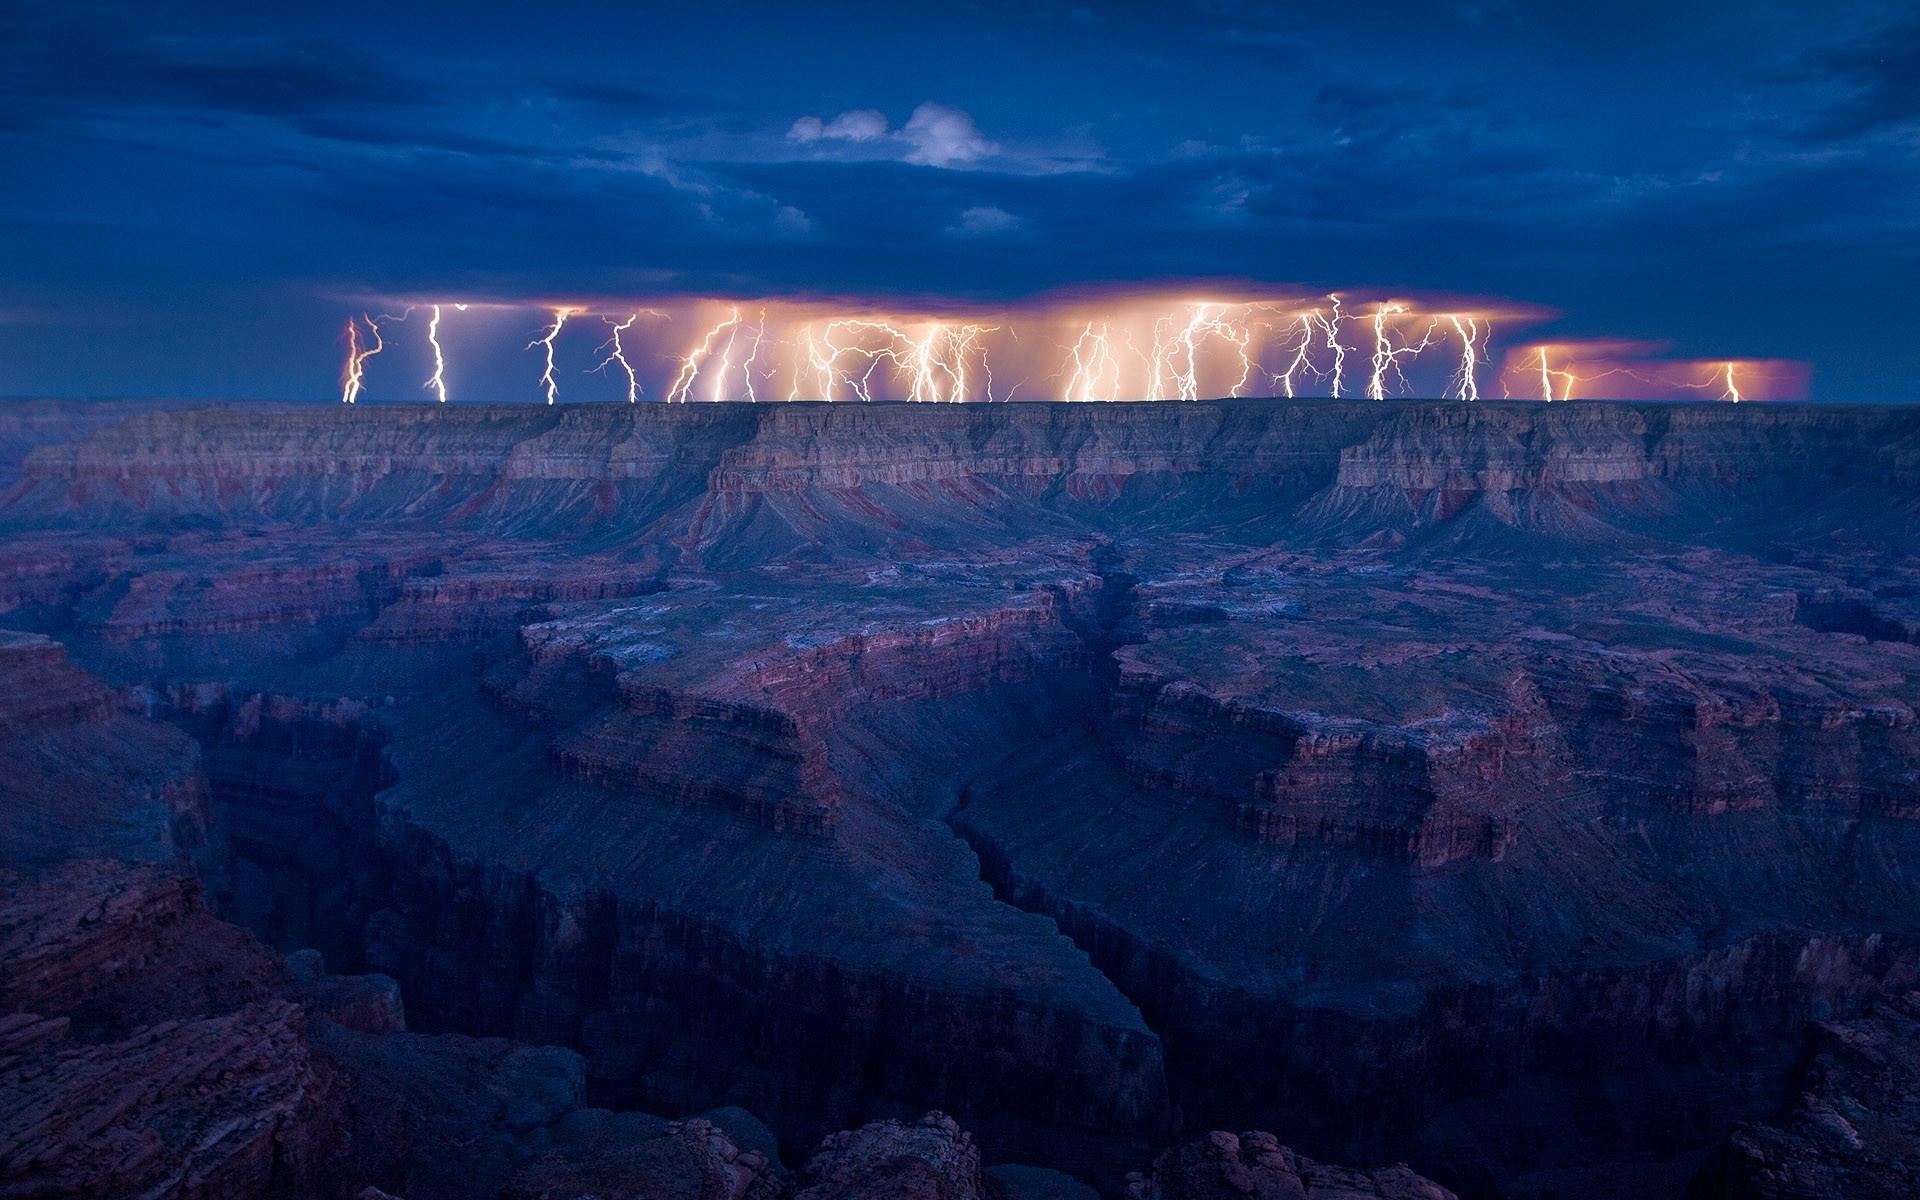 Thunderstorm Wallpaper 2560x1600px 905088 1920x1200